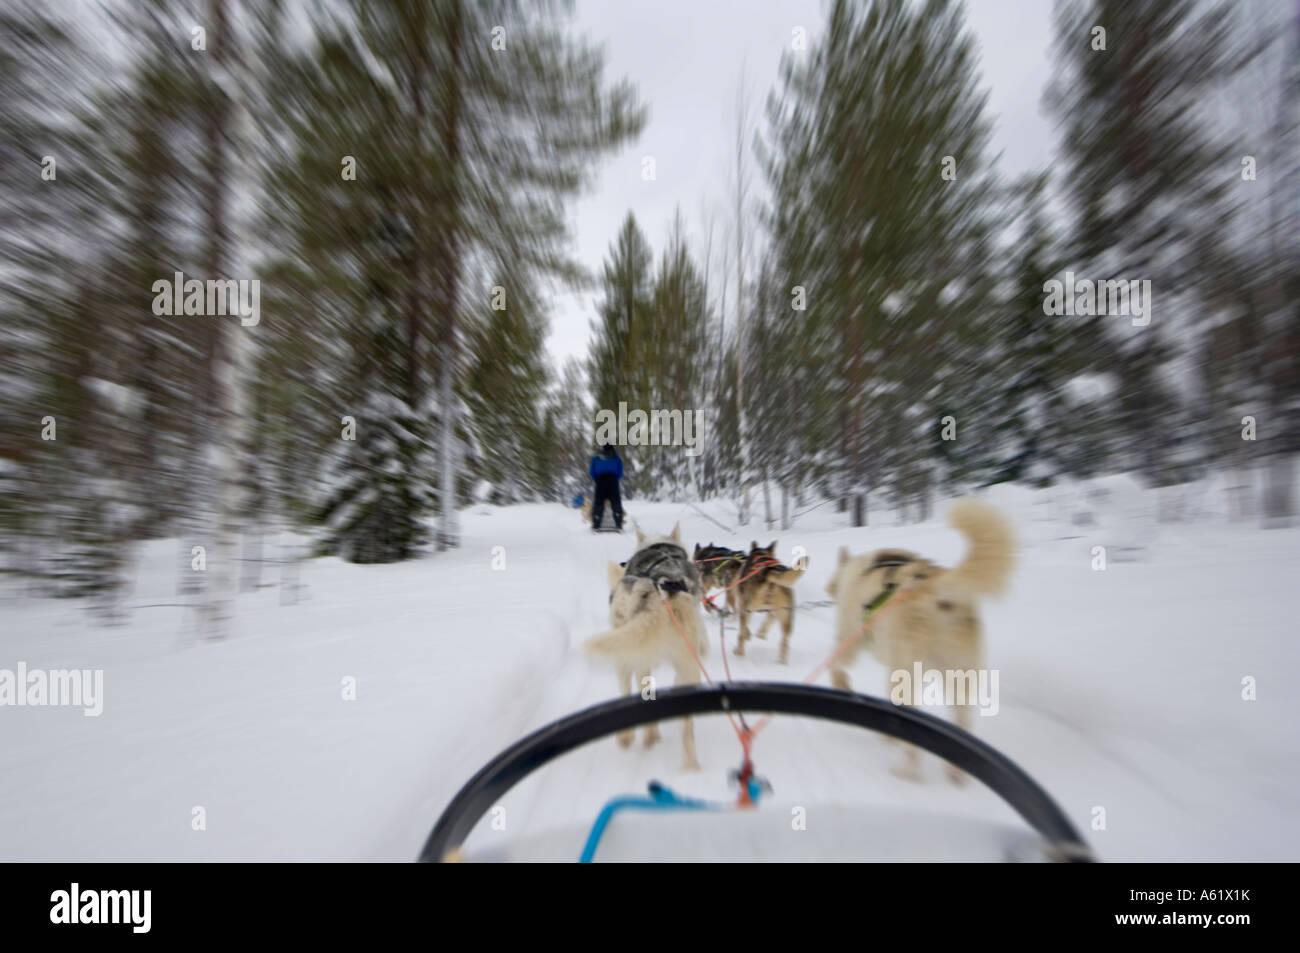 husky-sledding-speeding-through-the-fore